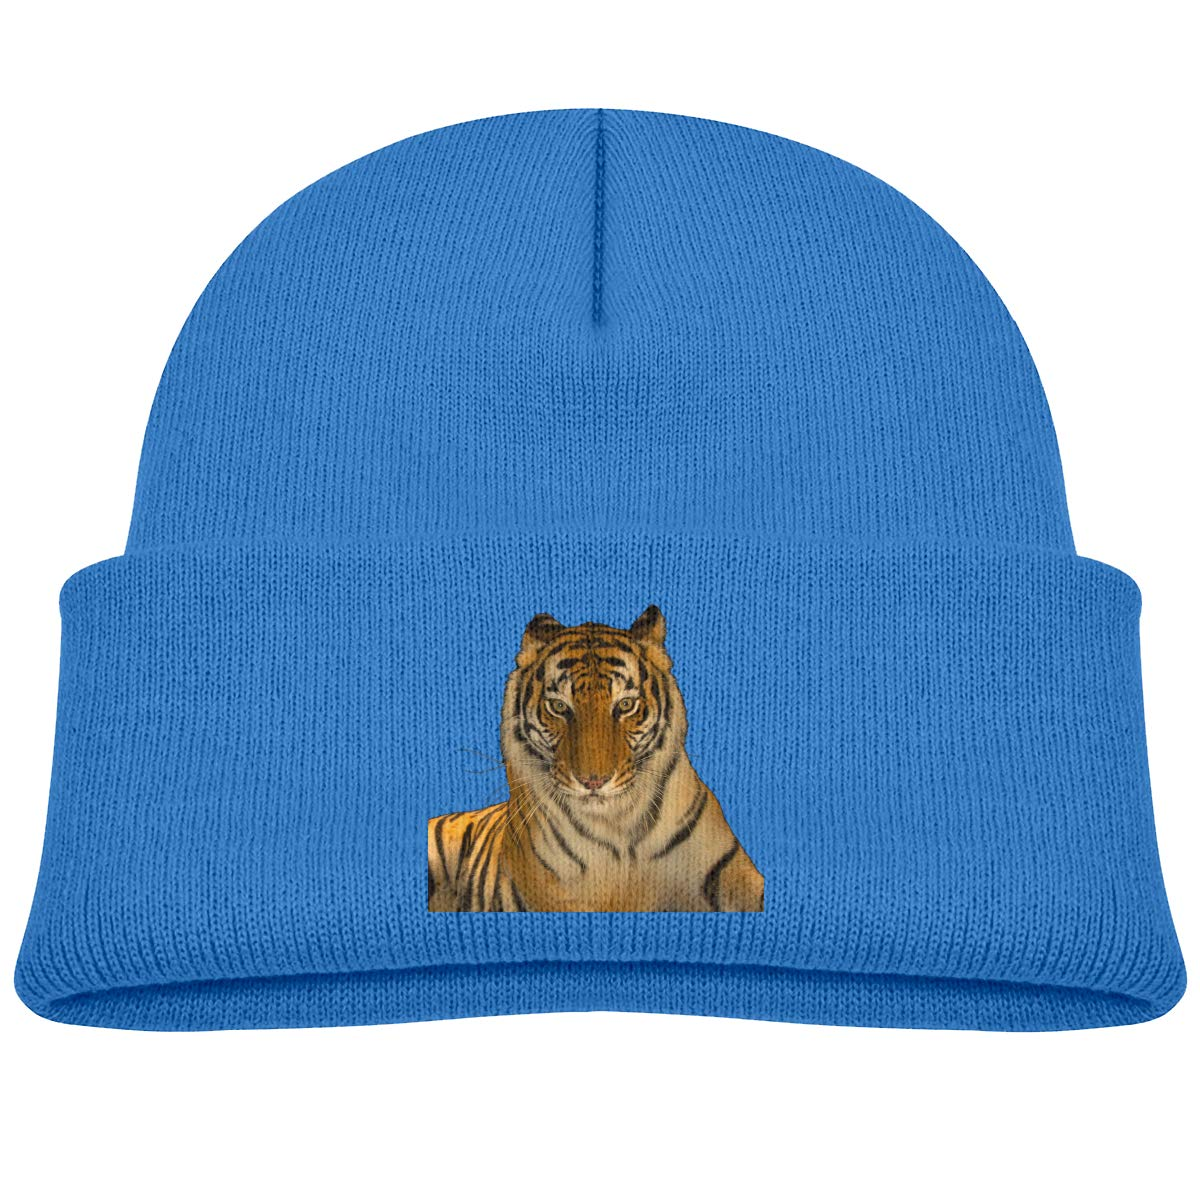 ACFUNEJRQ Bengal Tiger Childrens Autumn and Winter Warm Soft Cap Woolen Knitted Hat